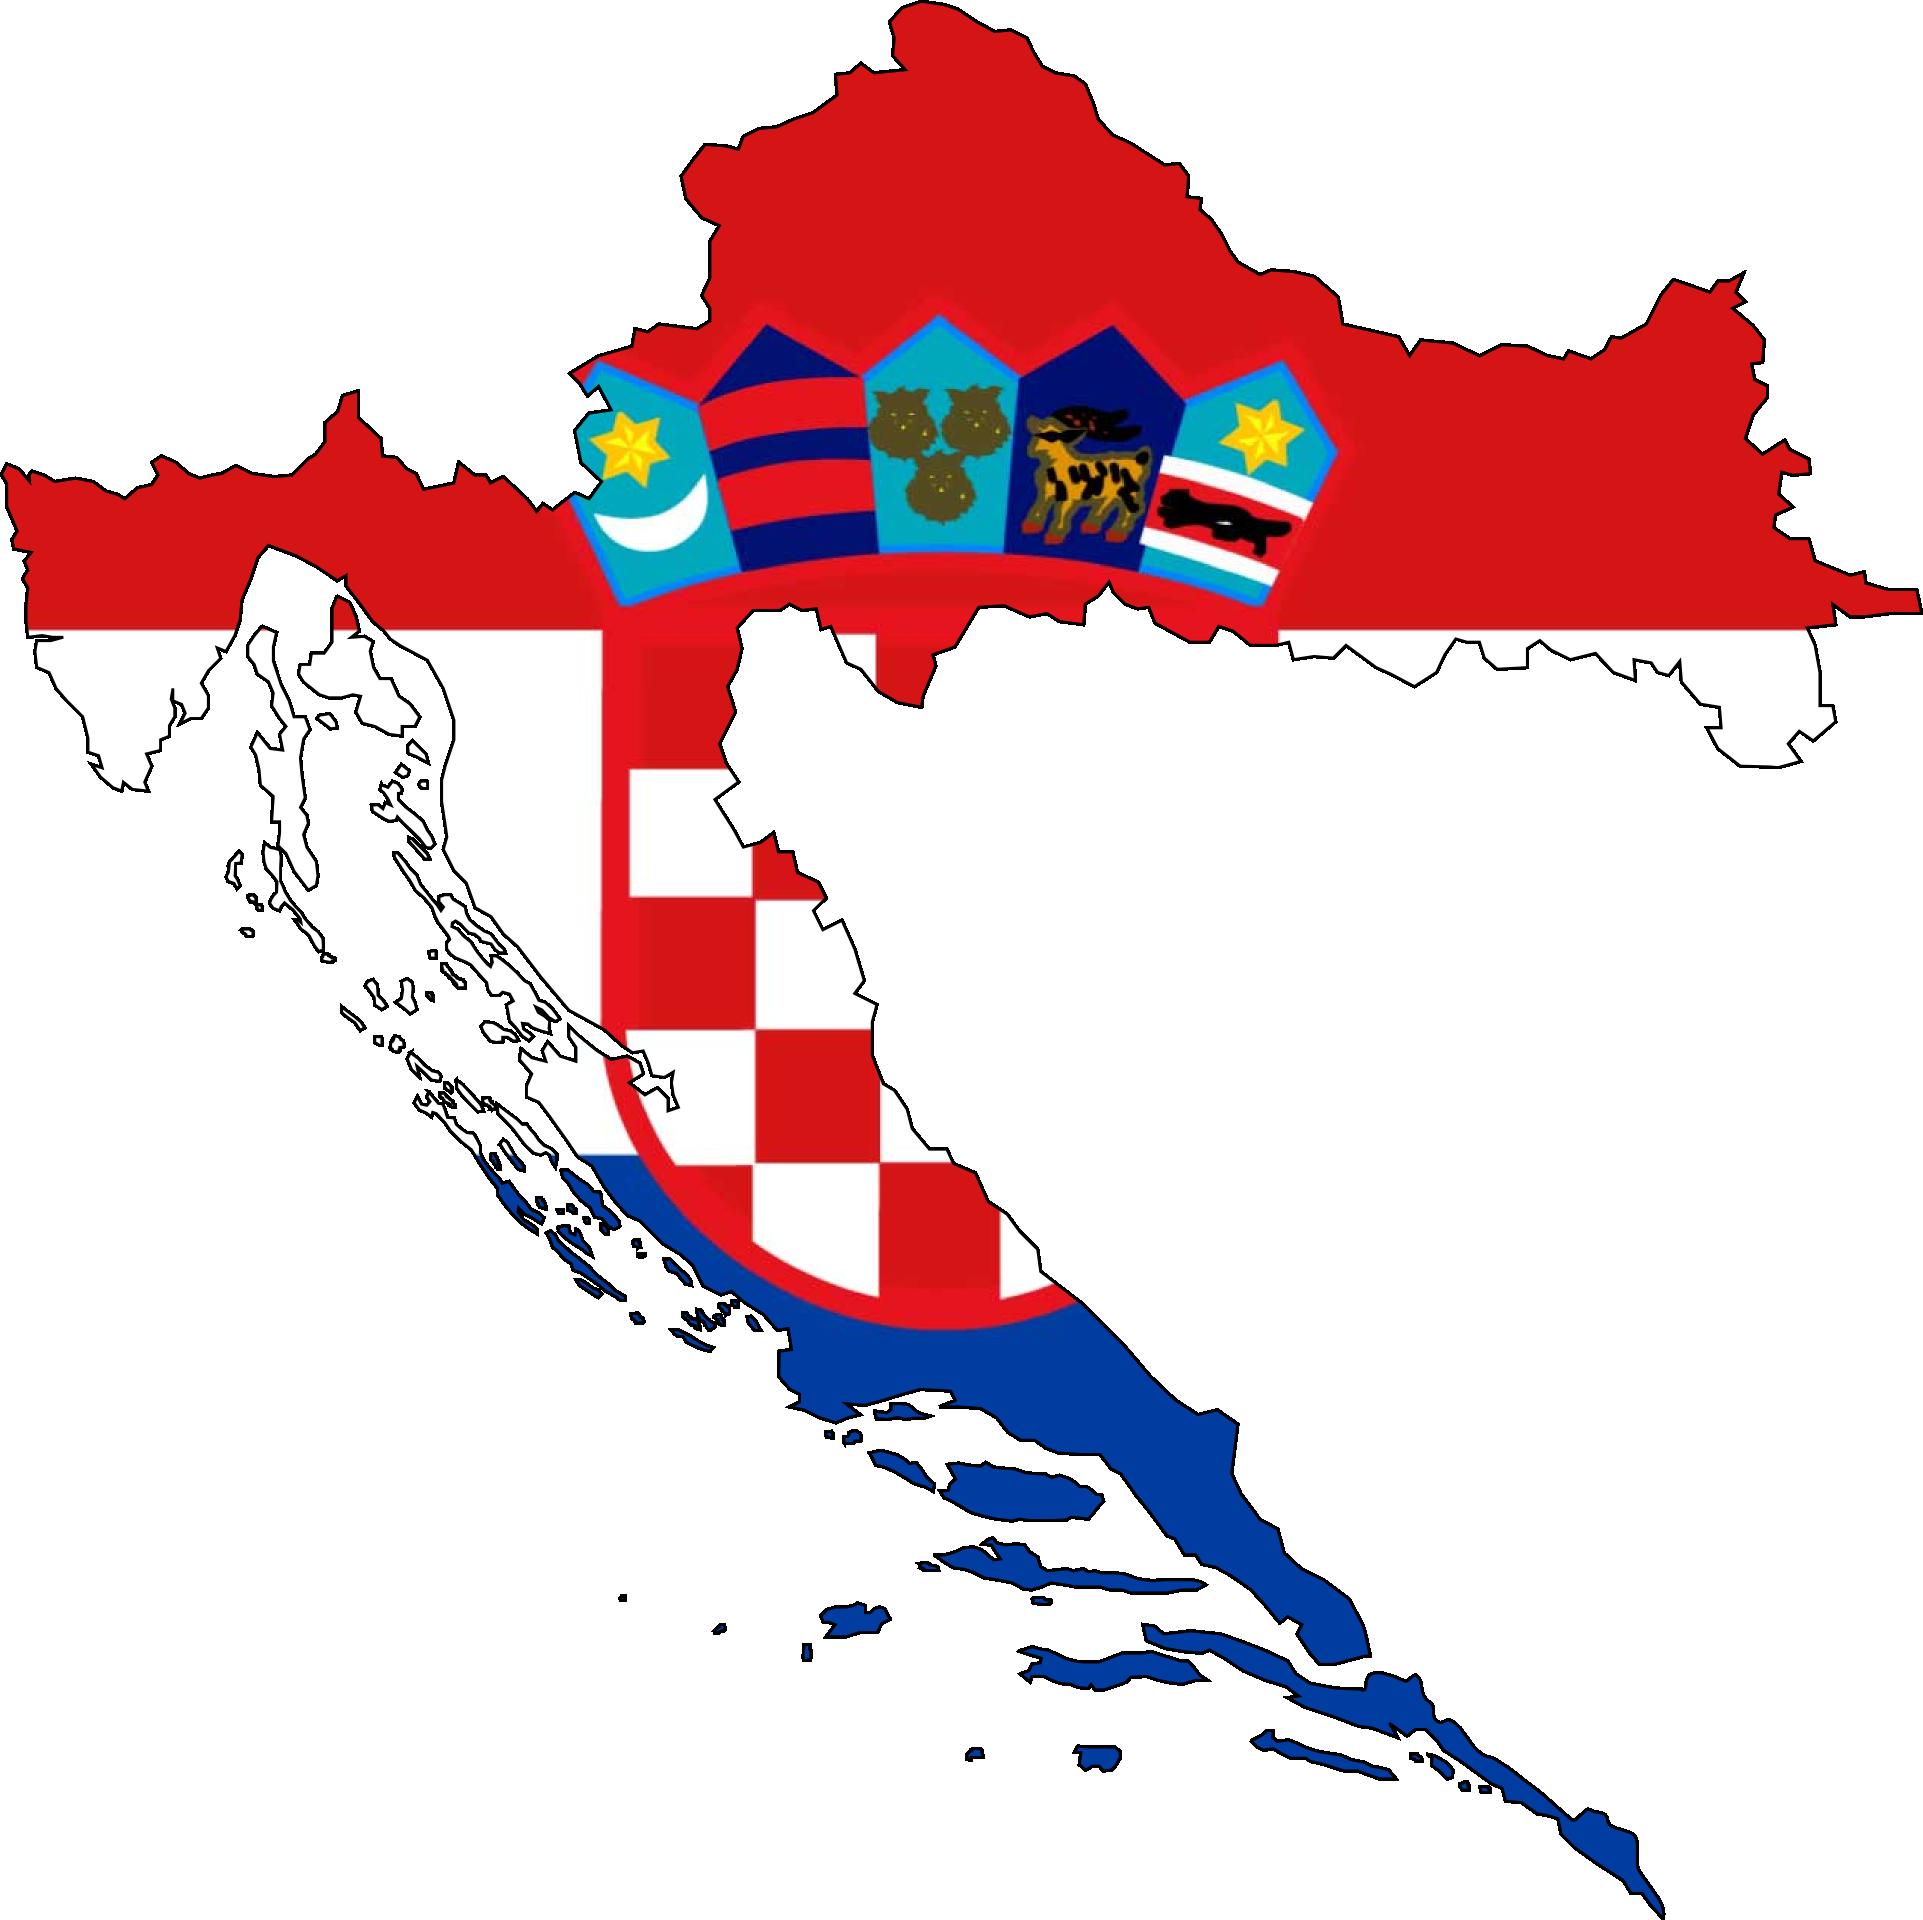 LokalnaHrvatska.hr Zagrebačka županija cestitka povodom Dana drzavnosti